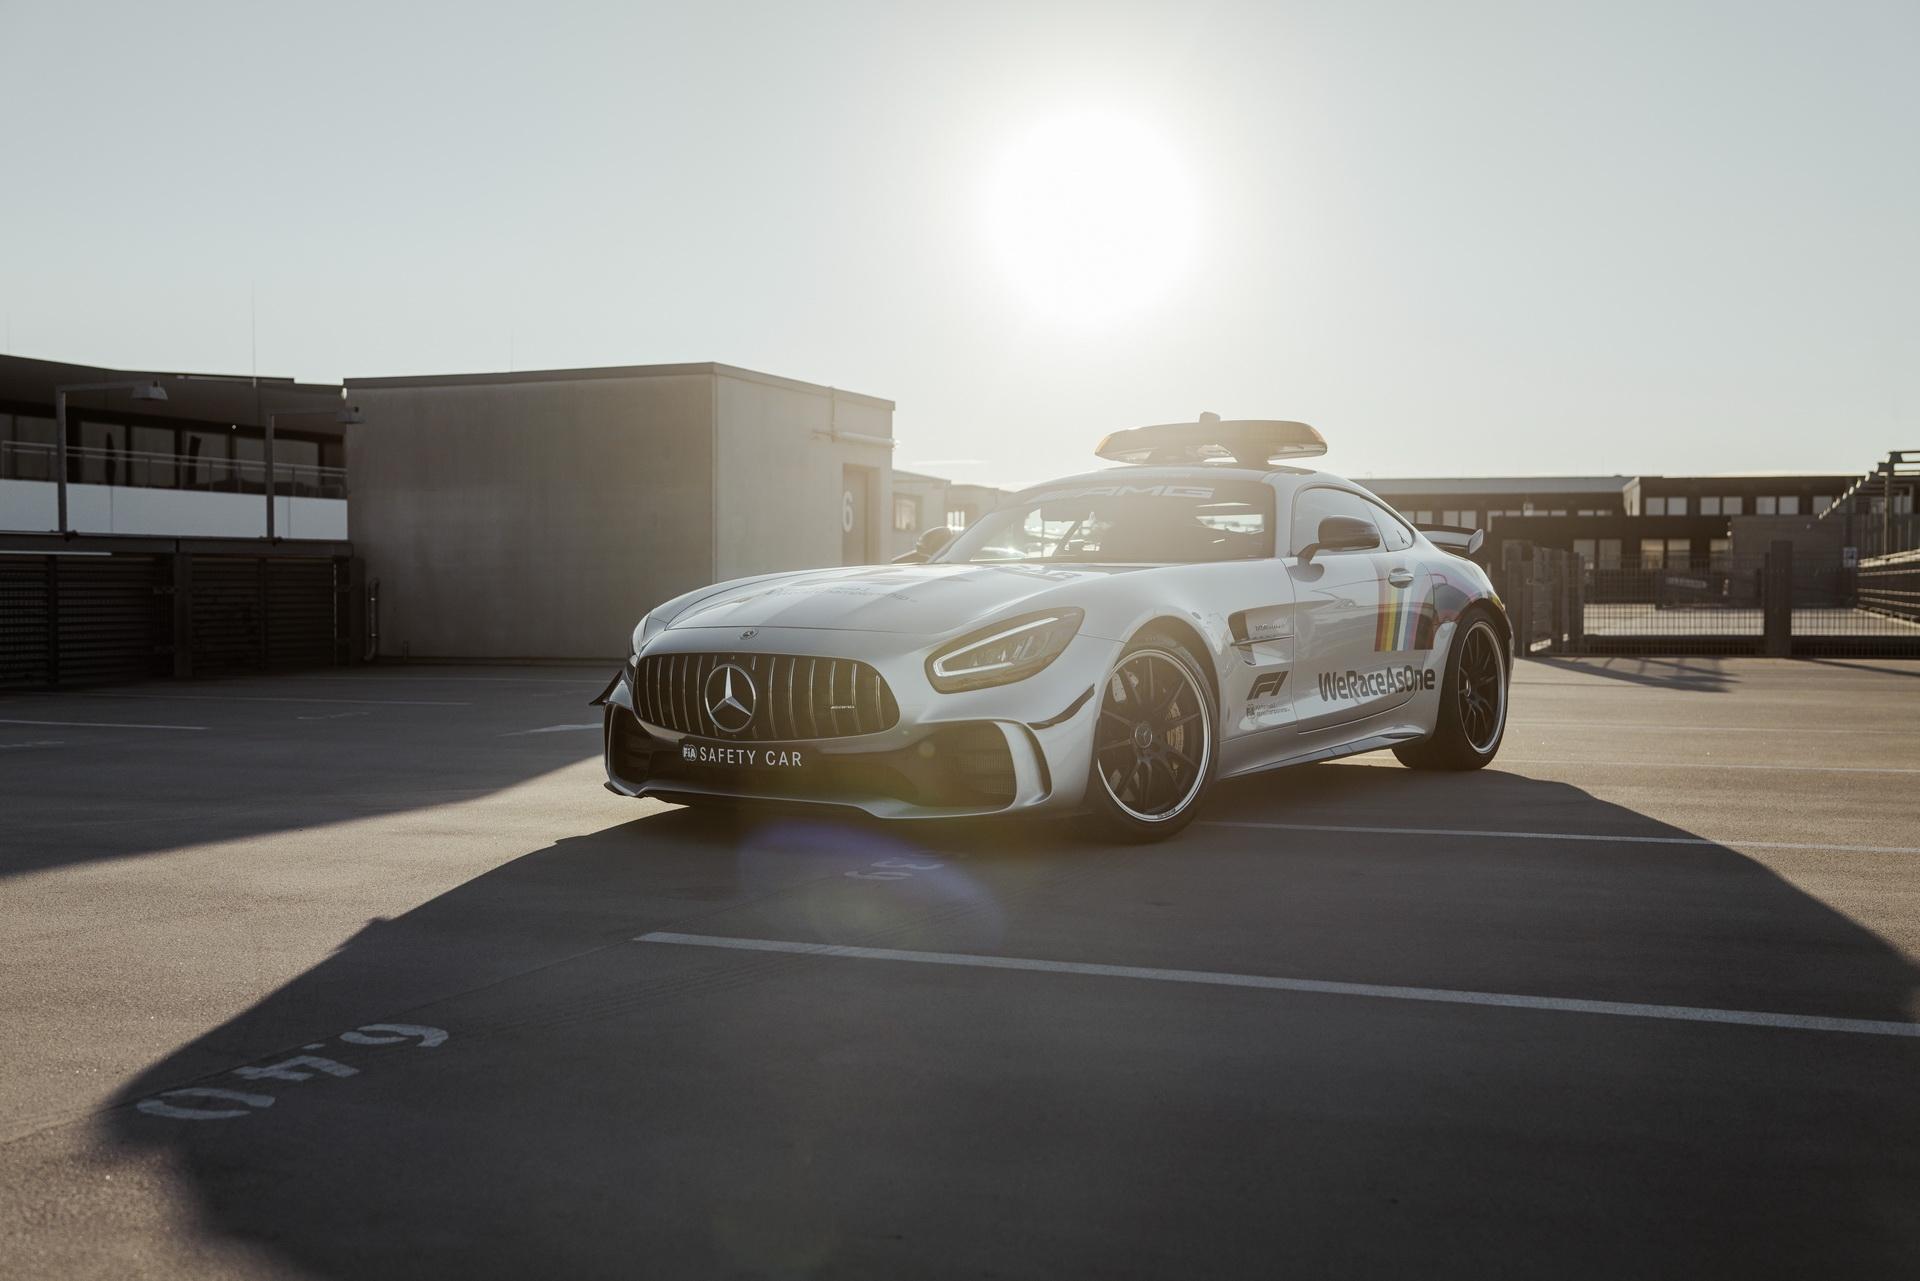 Mercedes-AMG GT R safety car F1 nuova livrea